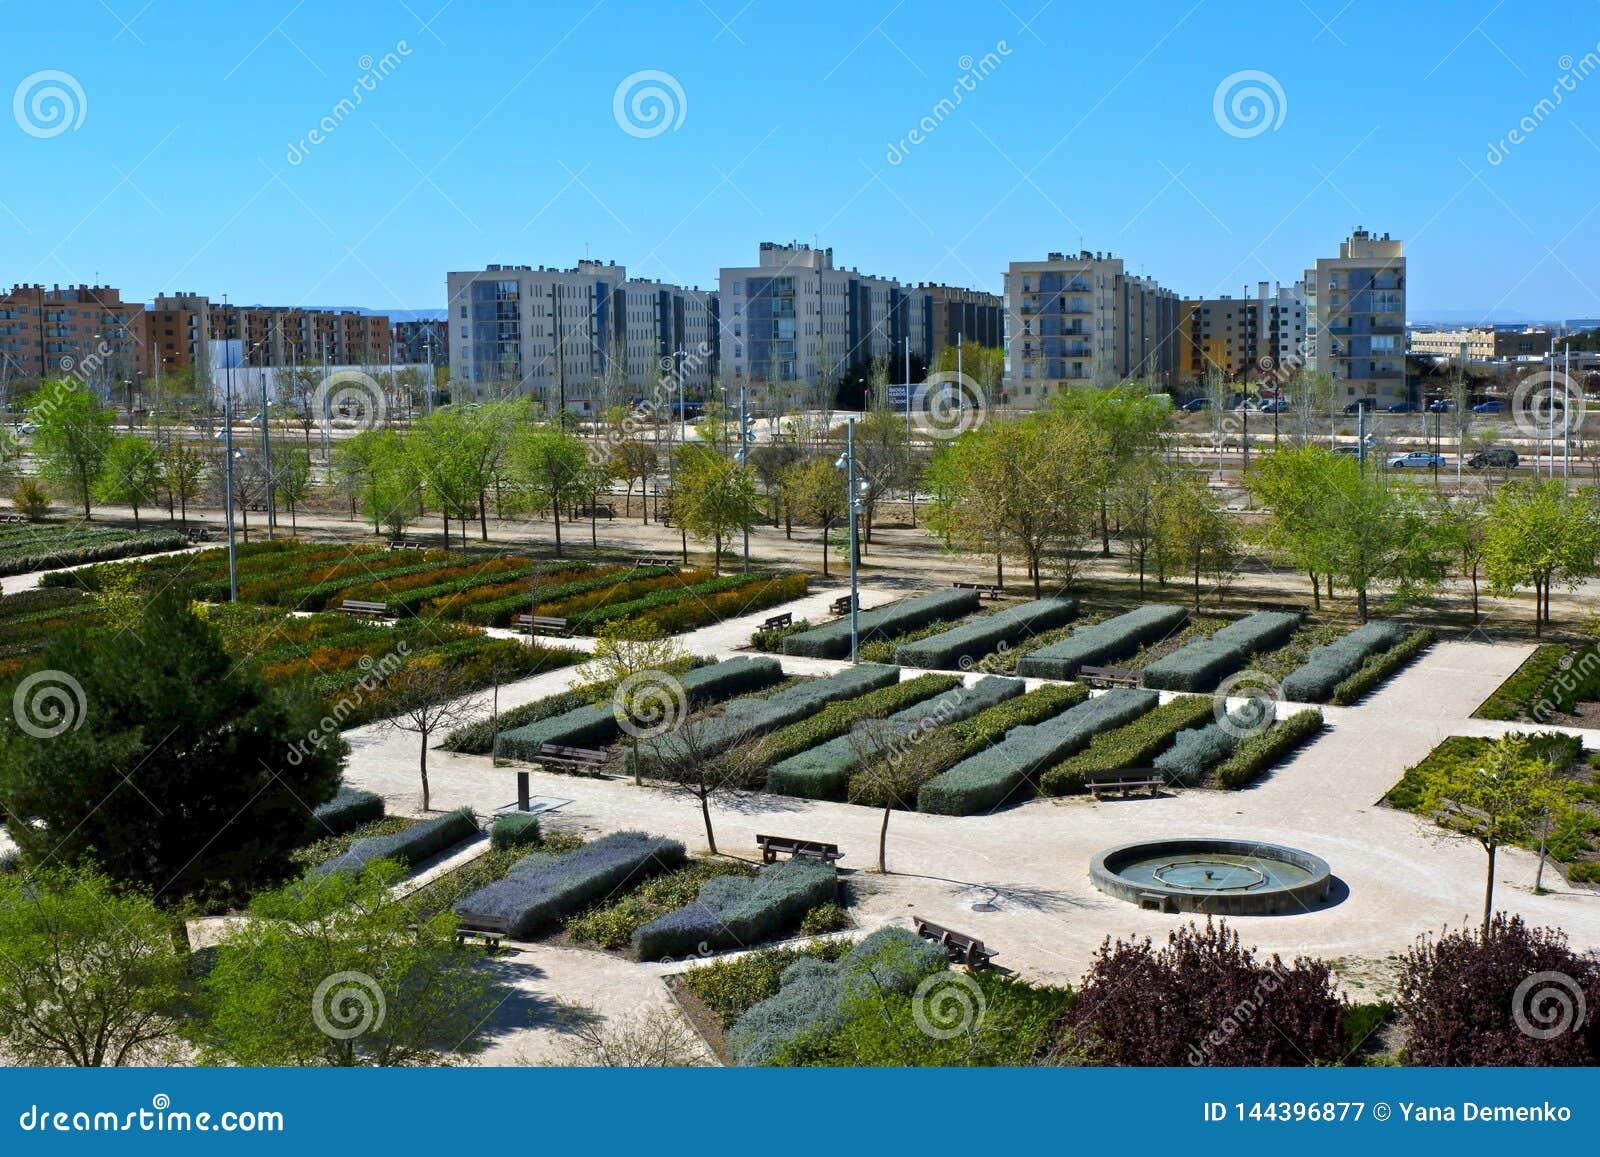 Valdespartera,萨瓦格萨/西班牙- 2019年3月27日:公园和居民住房的看法